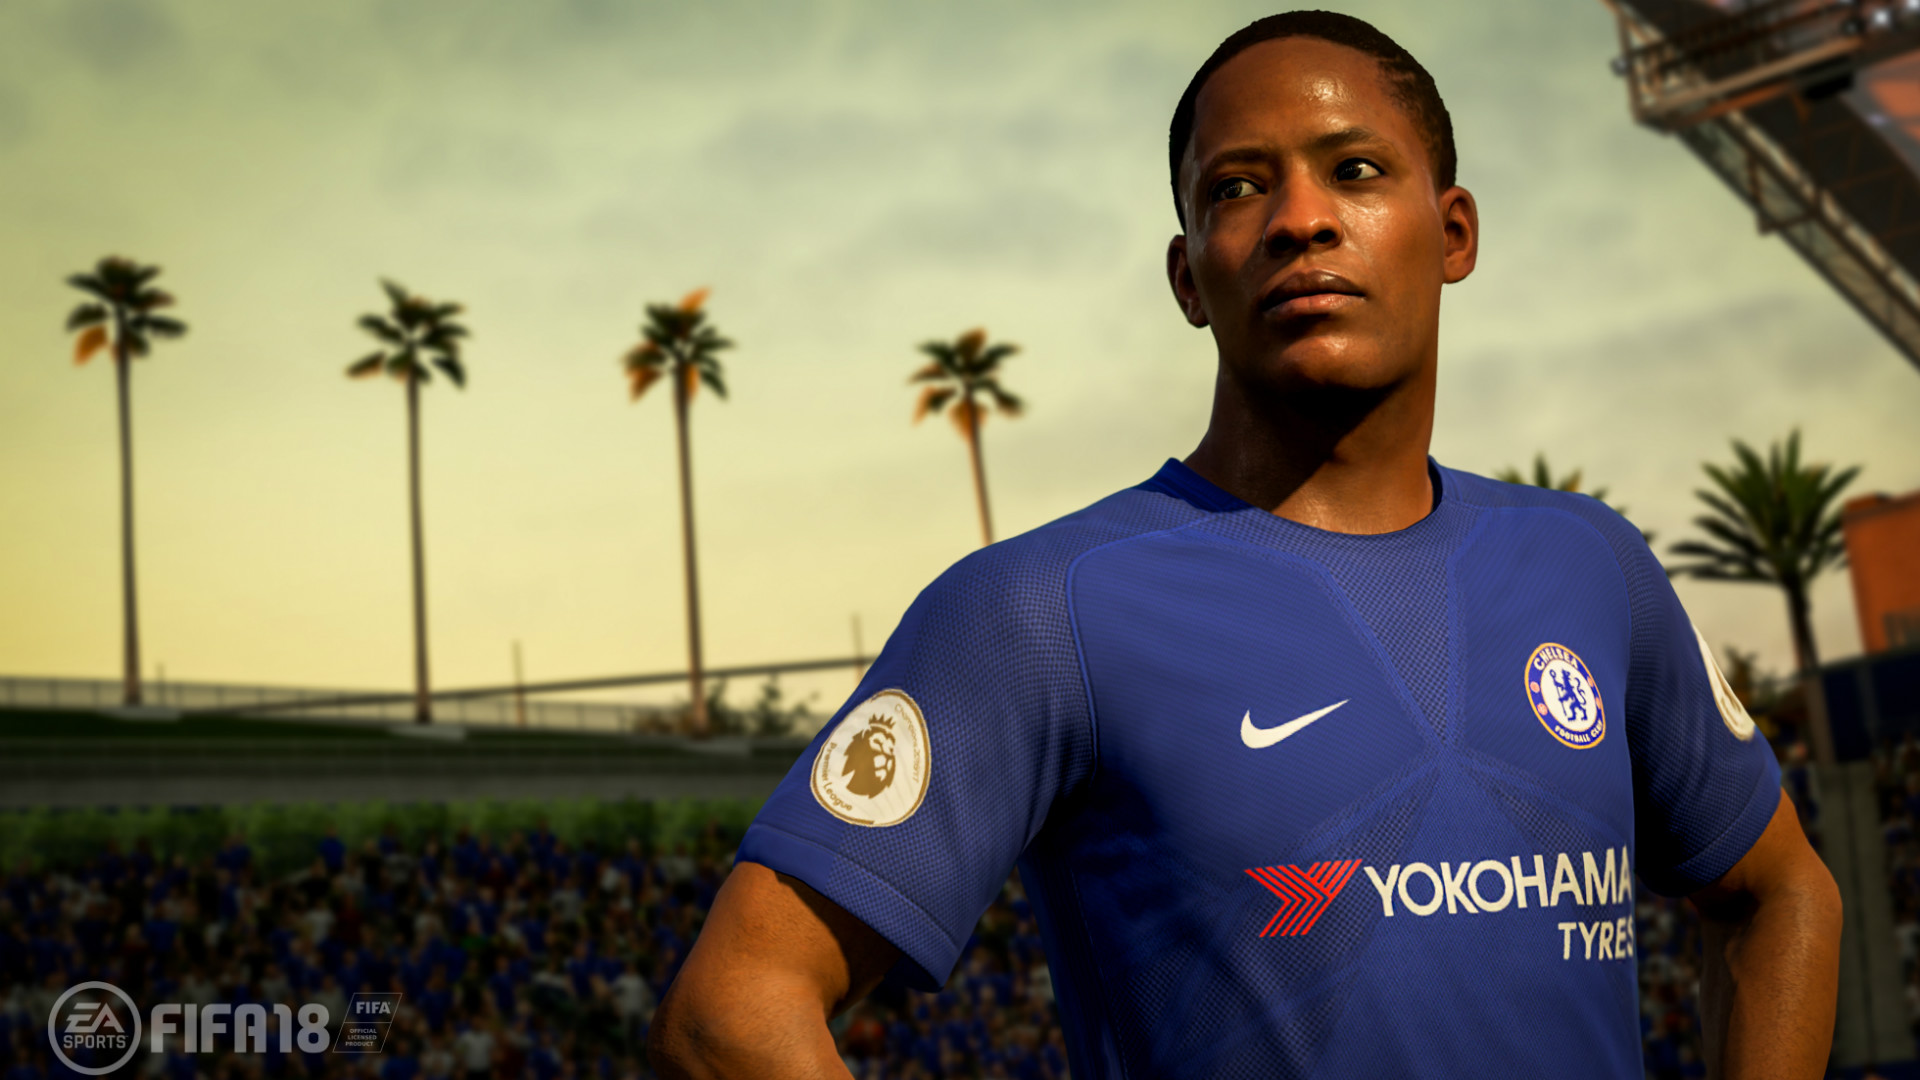 Chelsea launch new Nike kit for 2017/18 Premier League season